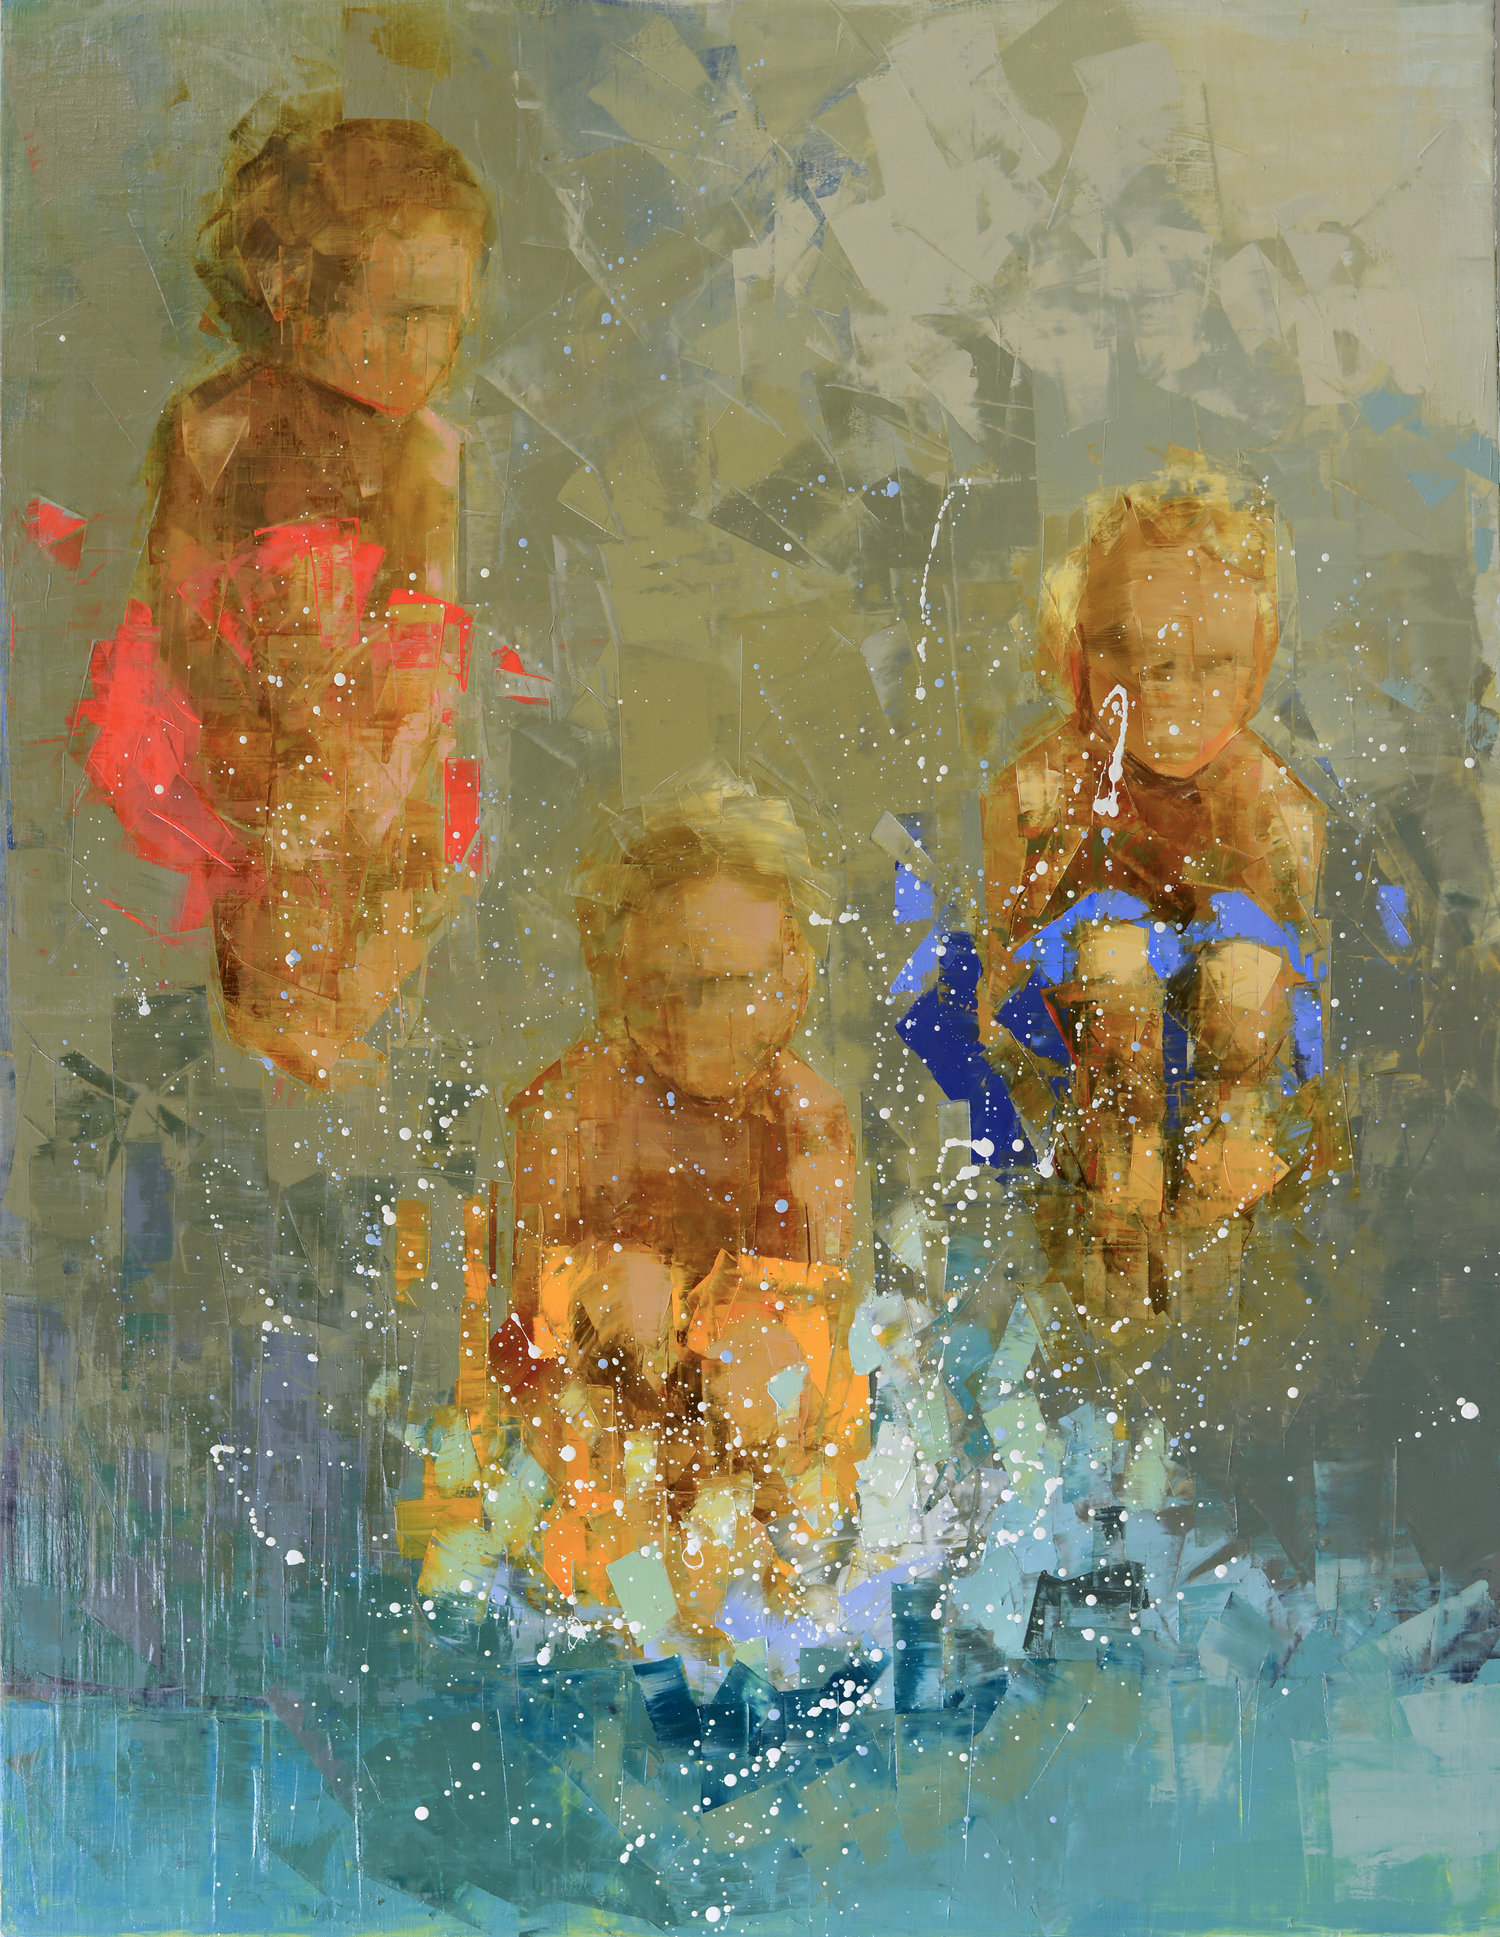 Swimming+Hole+(Cannonball)_70+x+54.jpg